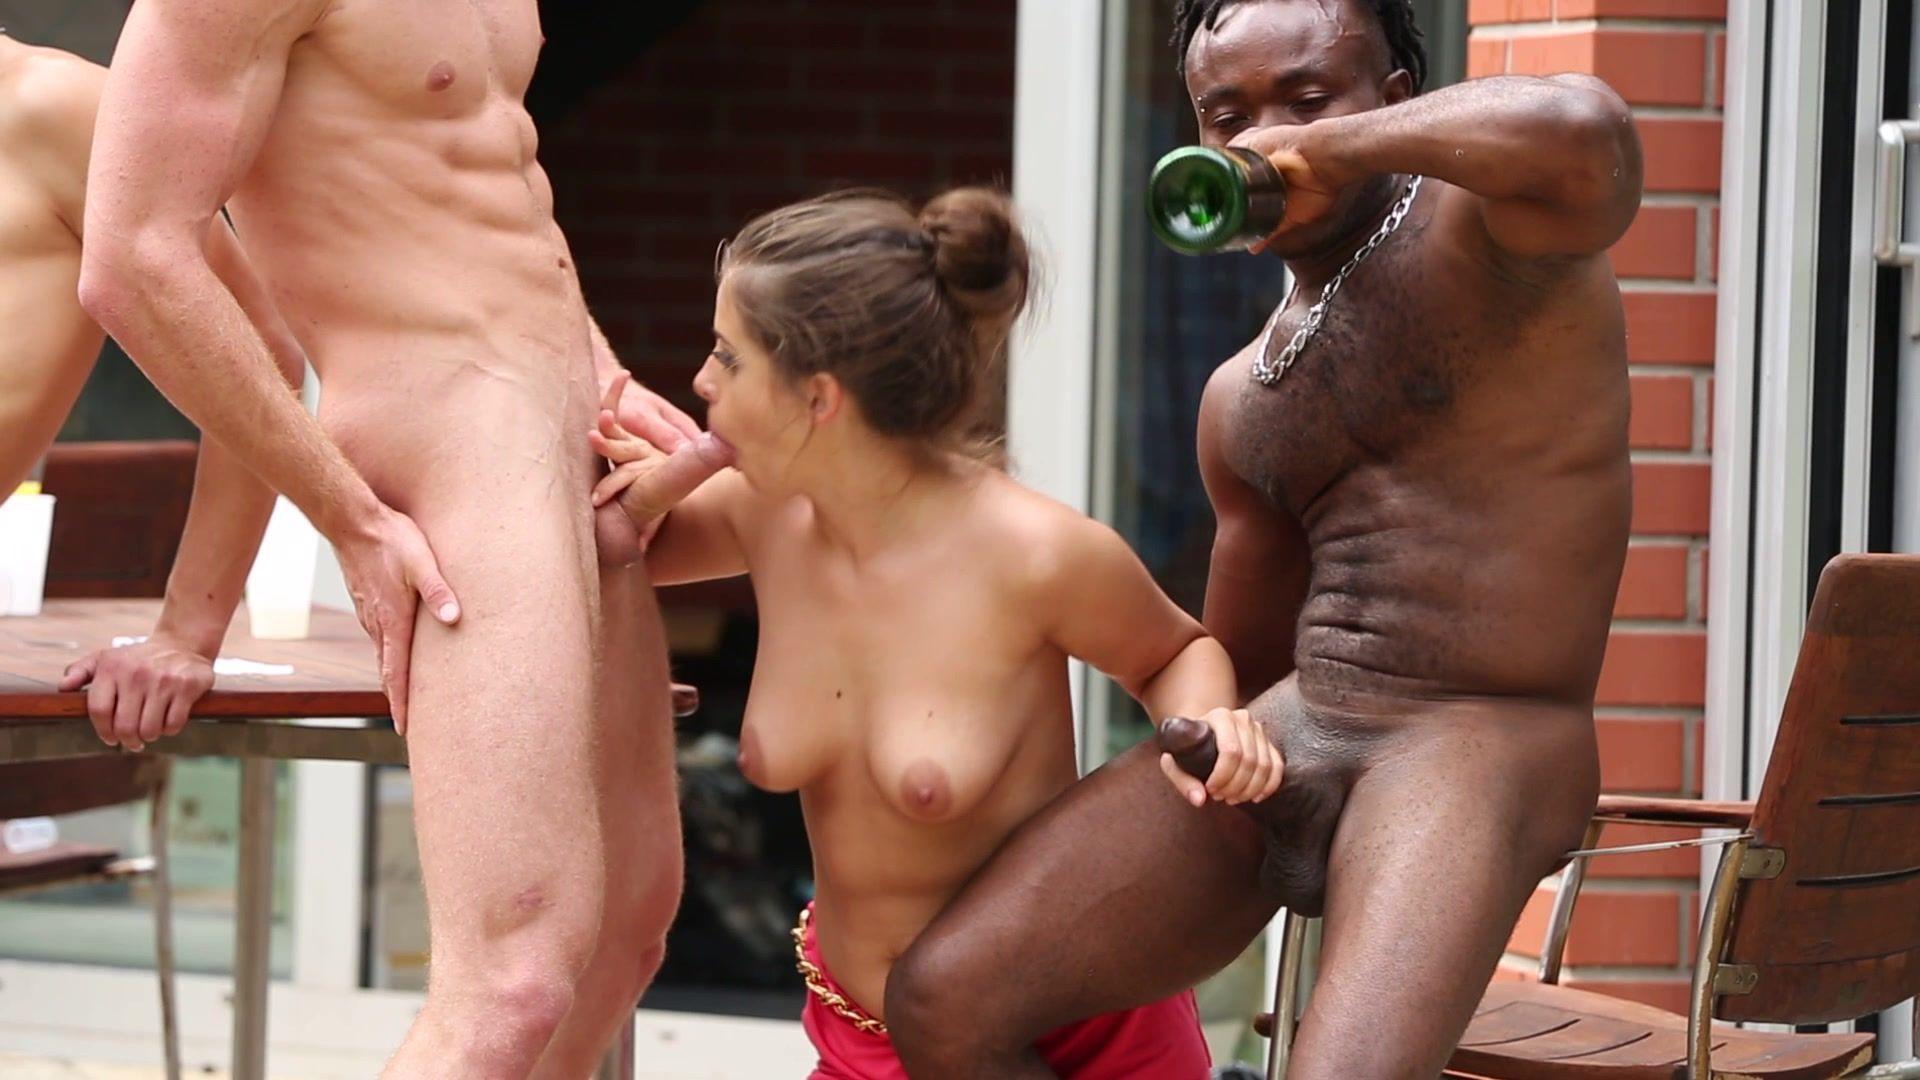 Bisex party pics